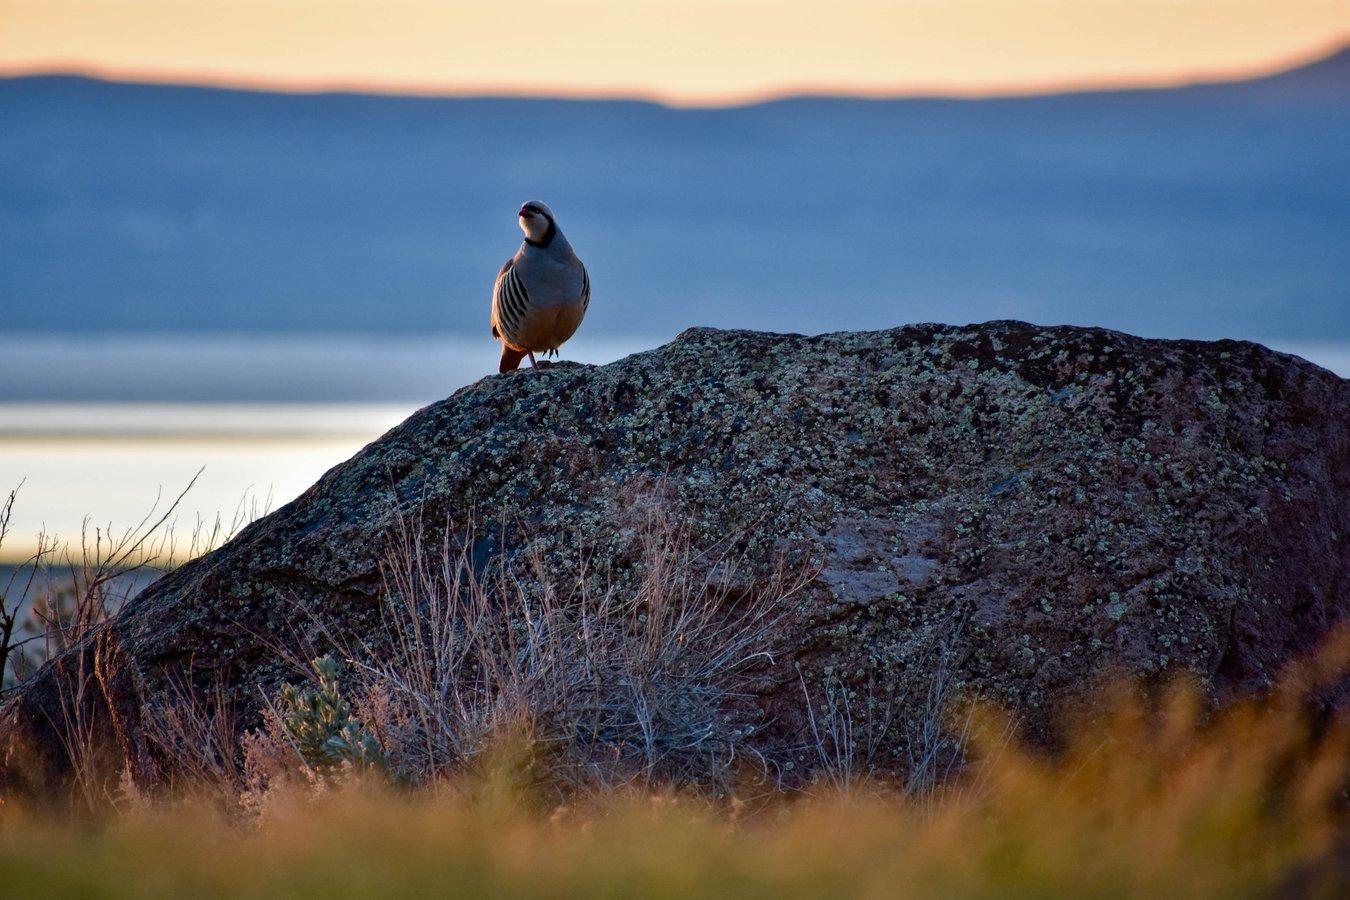 Chukar bird on rock Alvord Desert